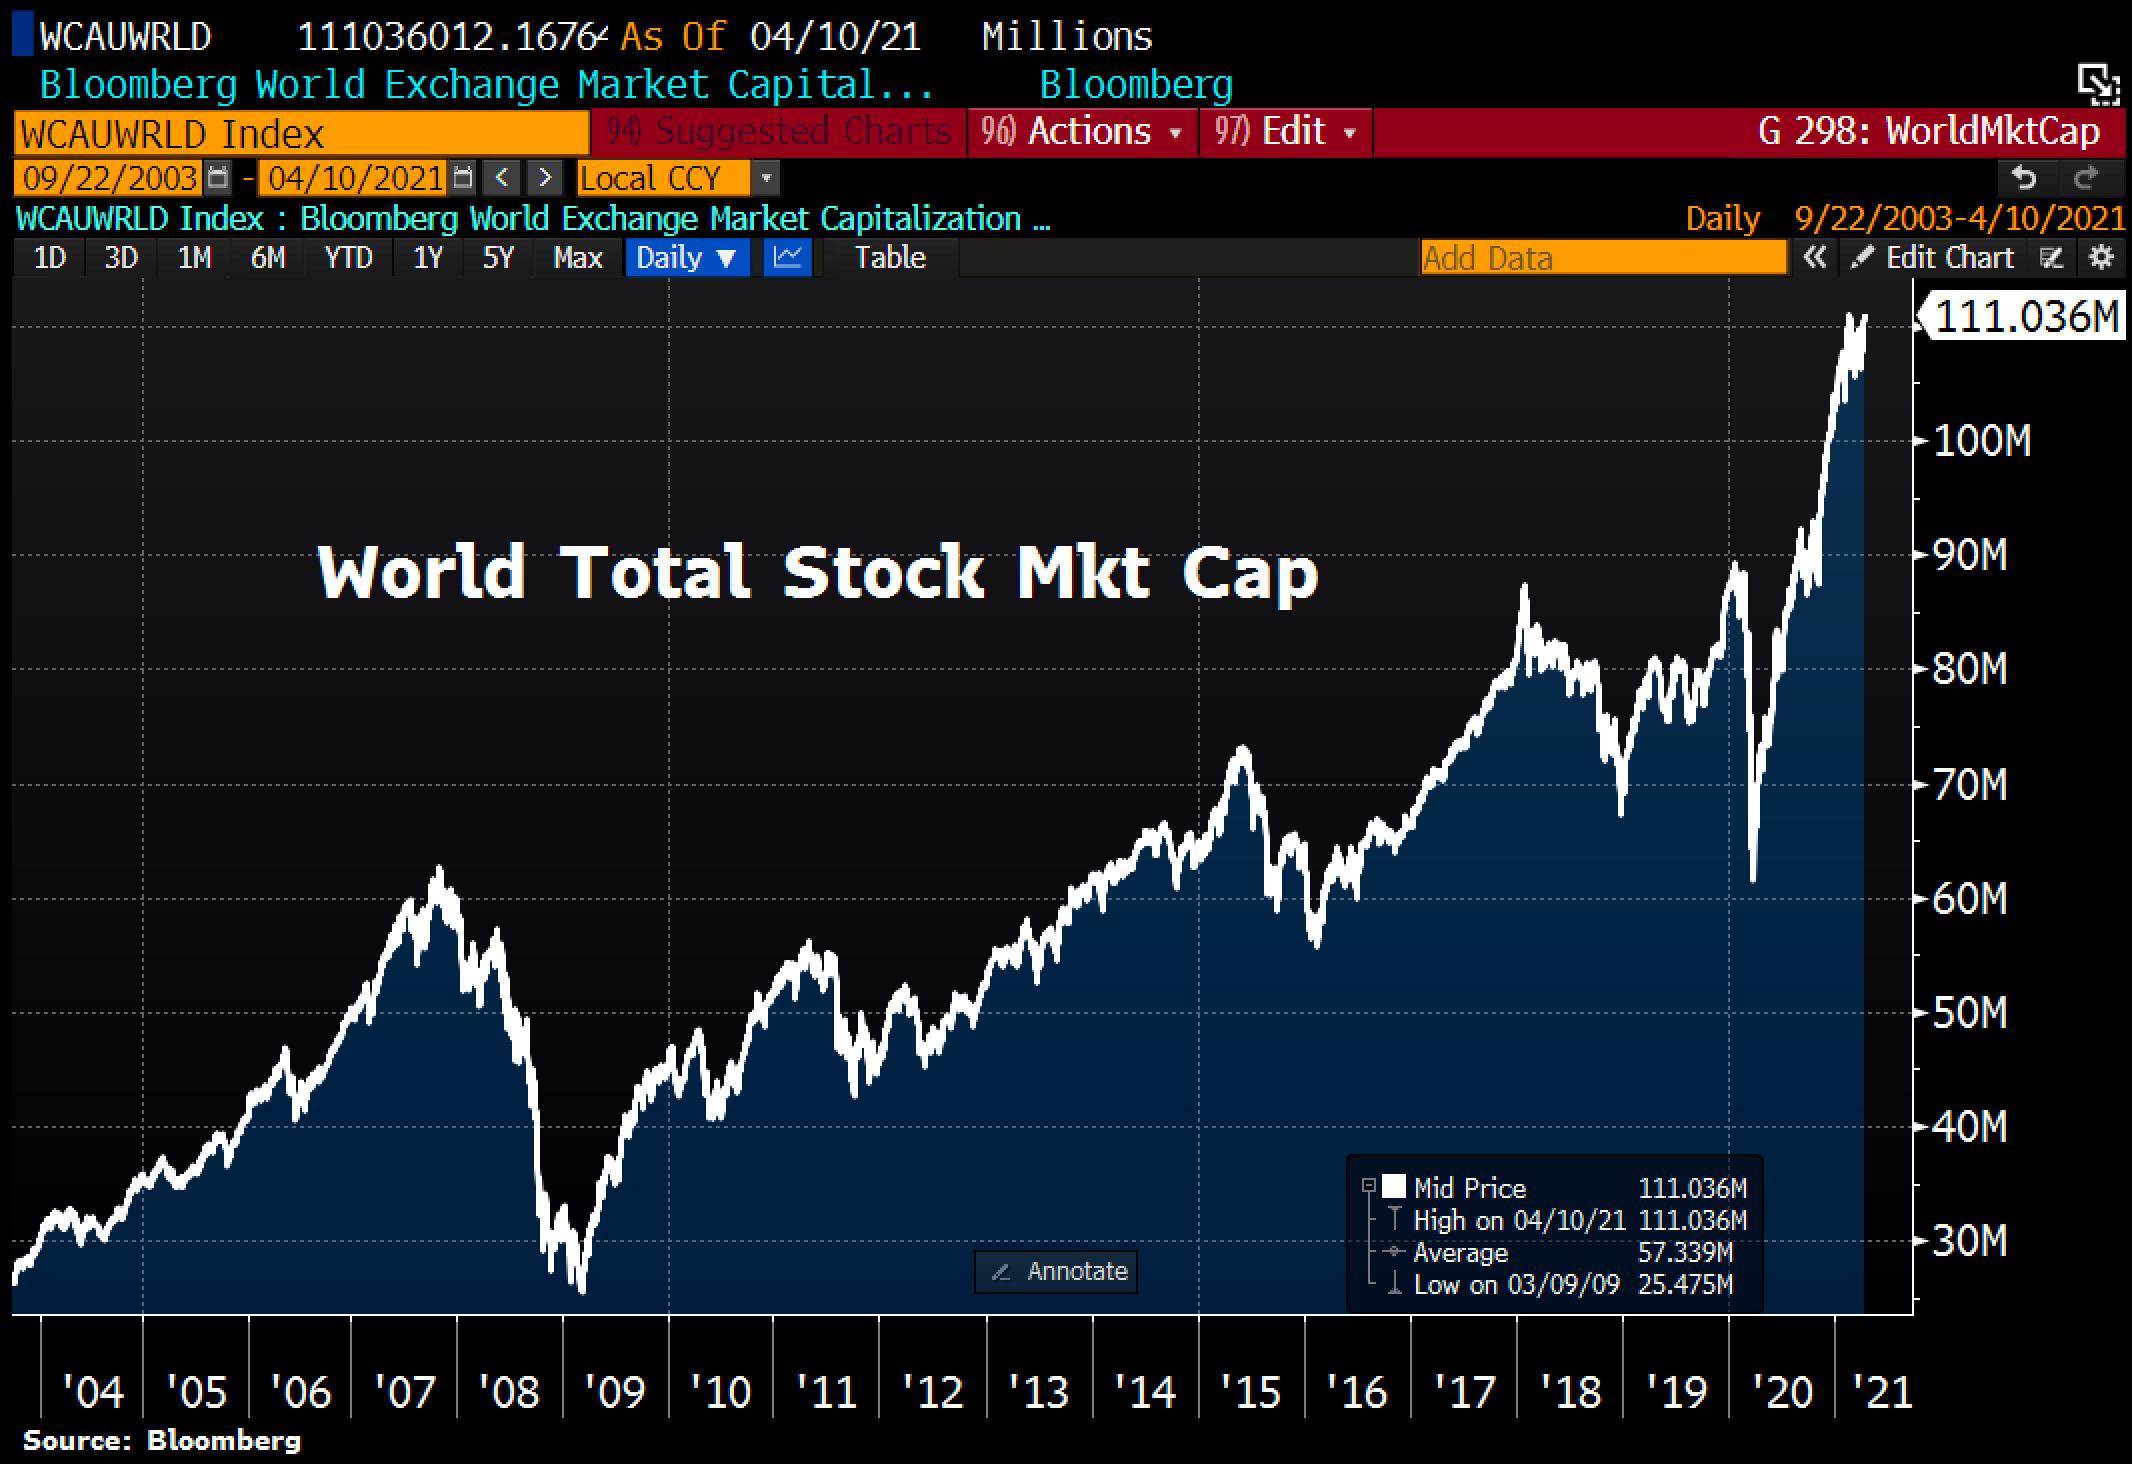 World Total Stock Mkt Cap.© Holger Zschaepitz via Twitter @Schuldensuehner, April 11th, 2021.